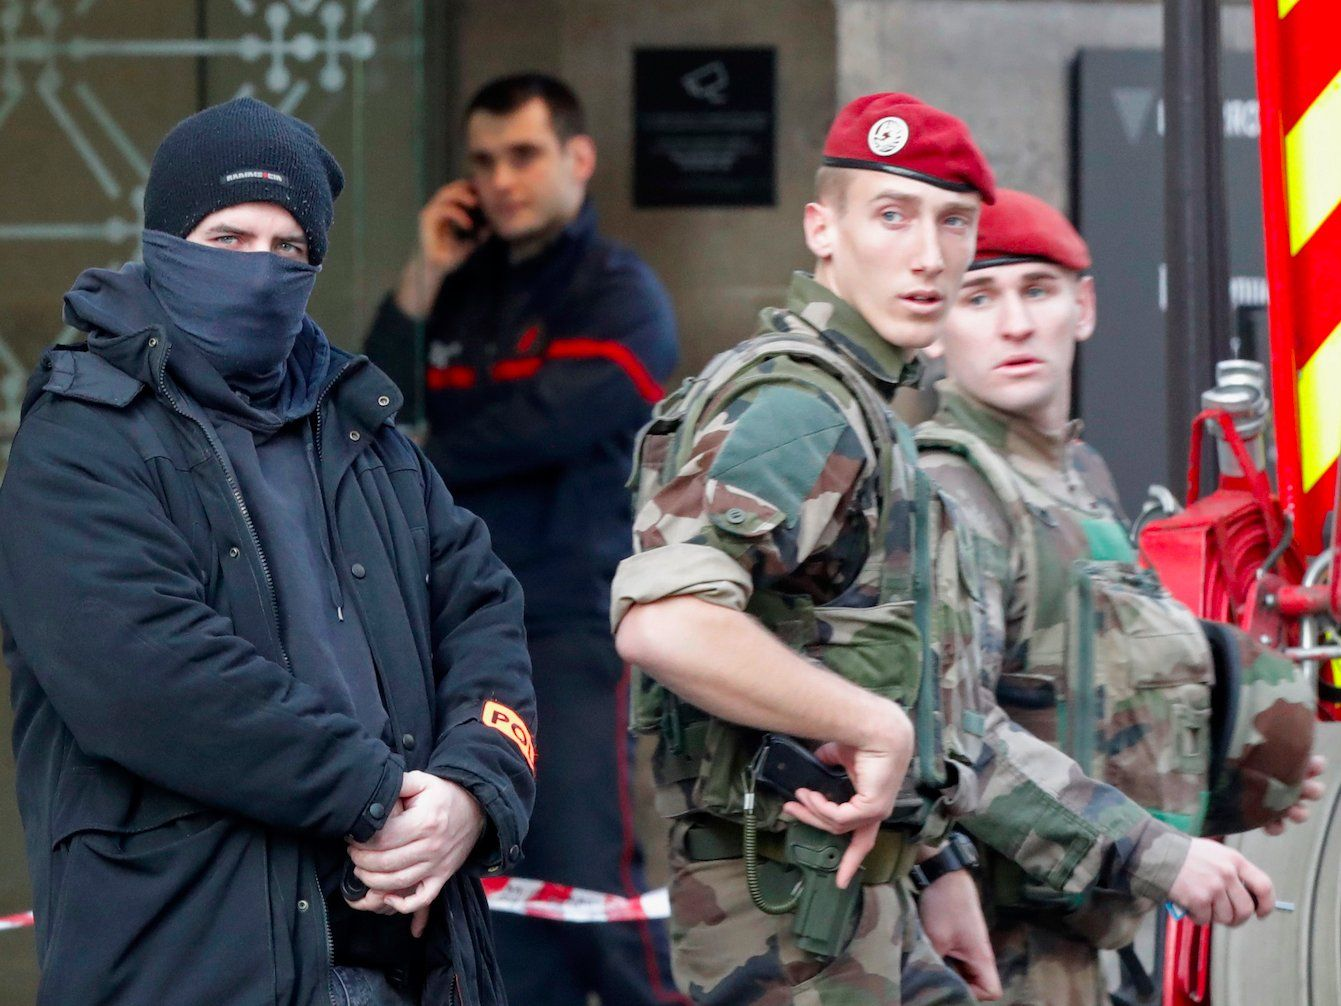 'GET SMART U.S.': Trump warns after man he calls 'radical Islamic terrorist' attacks Louvre museum in Paris